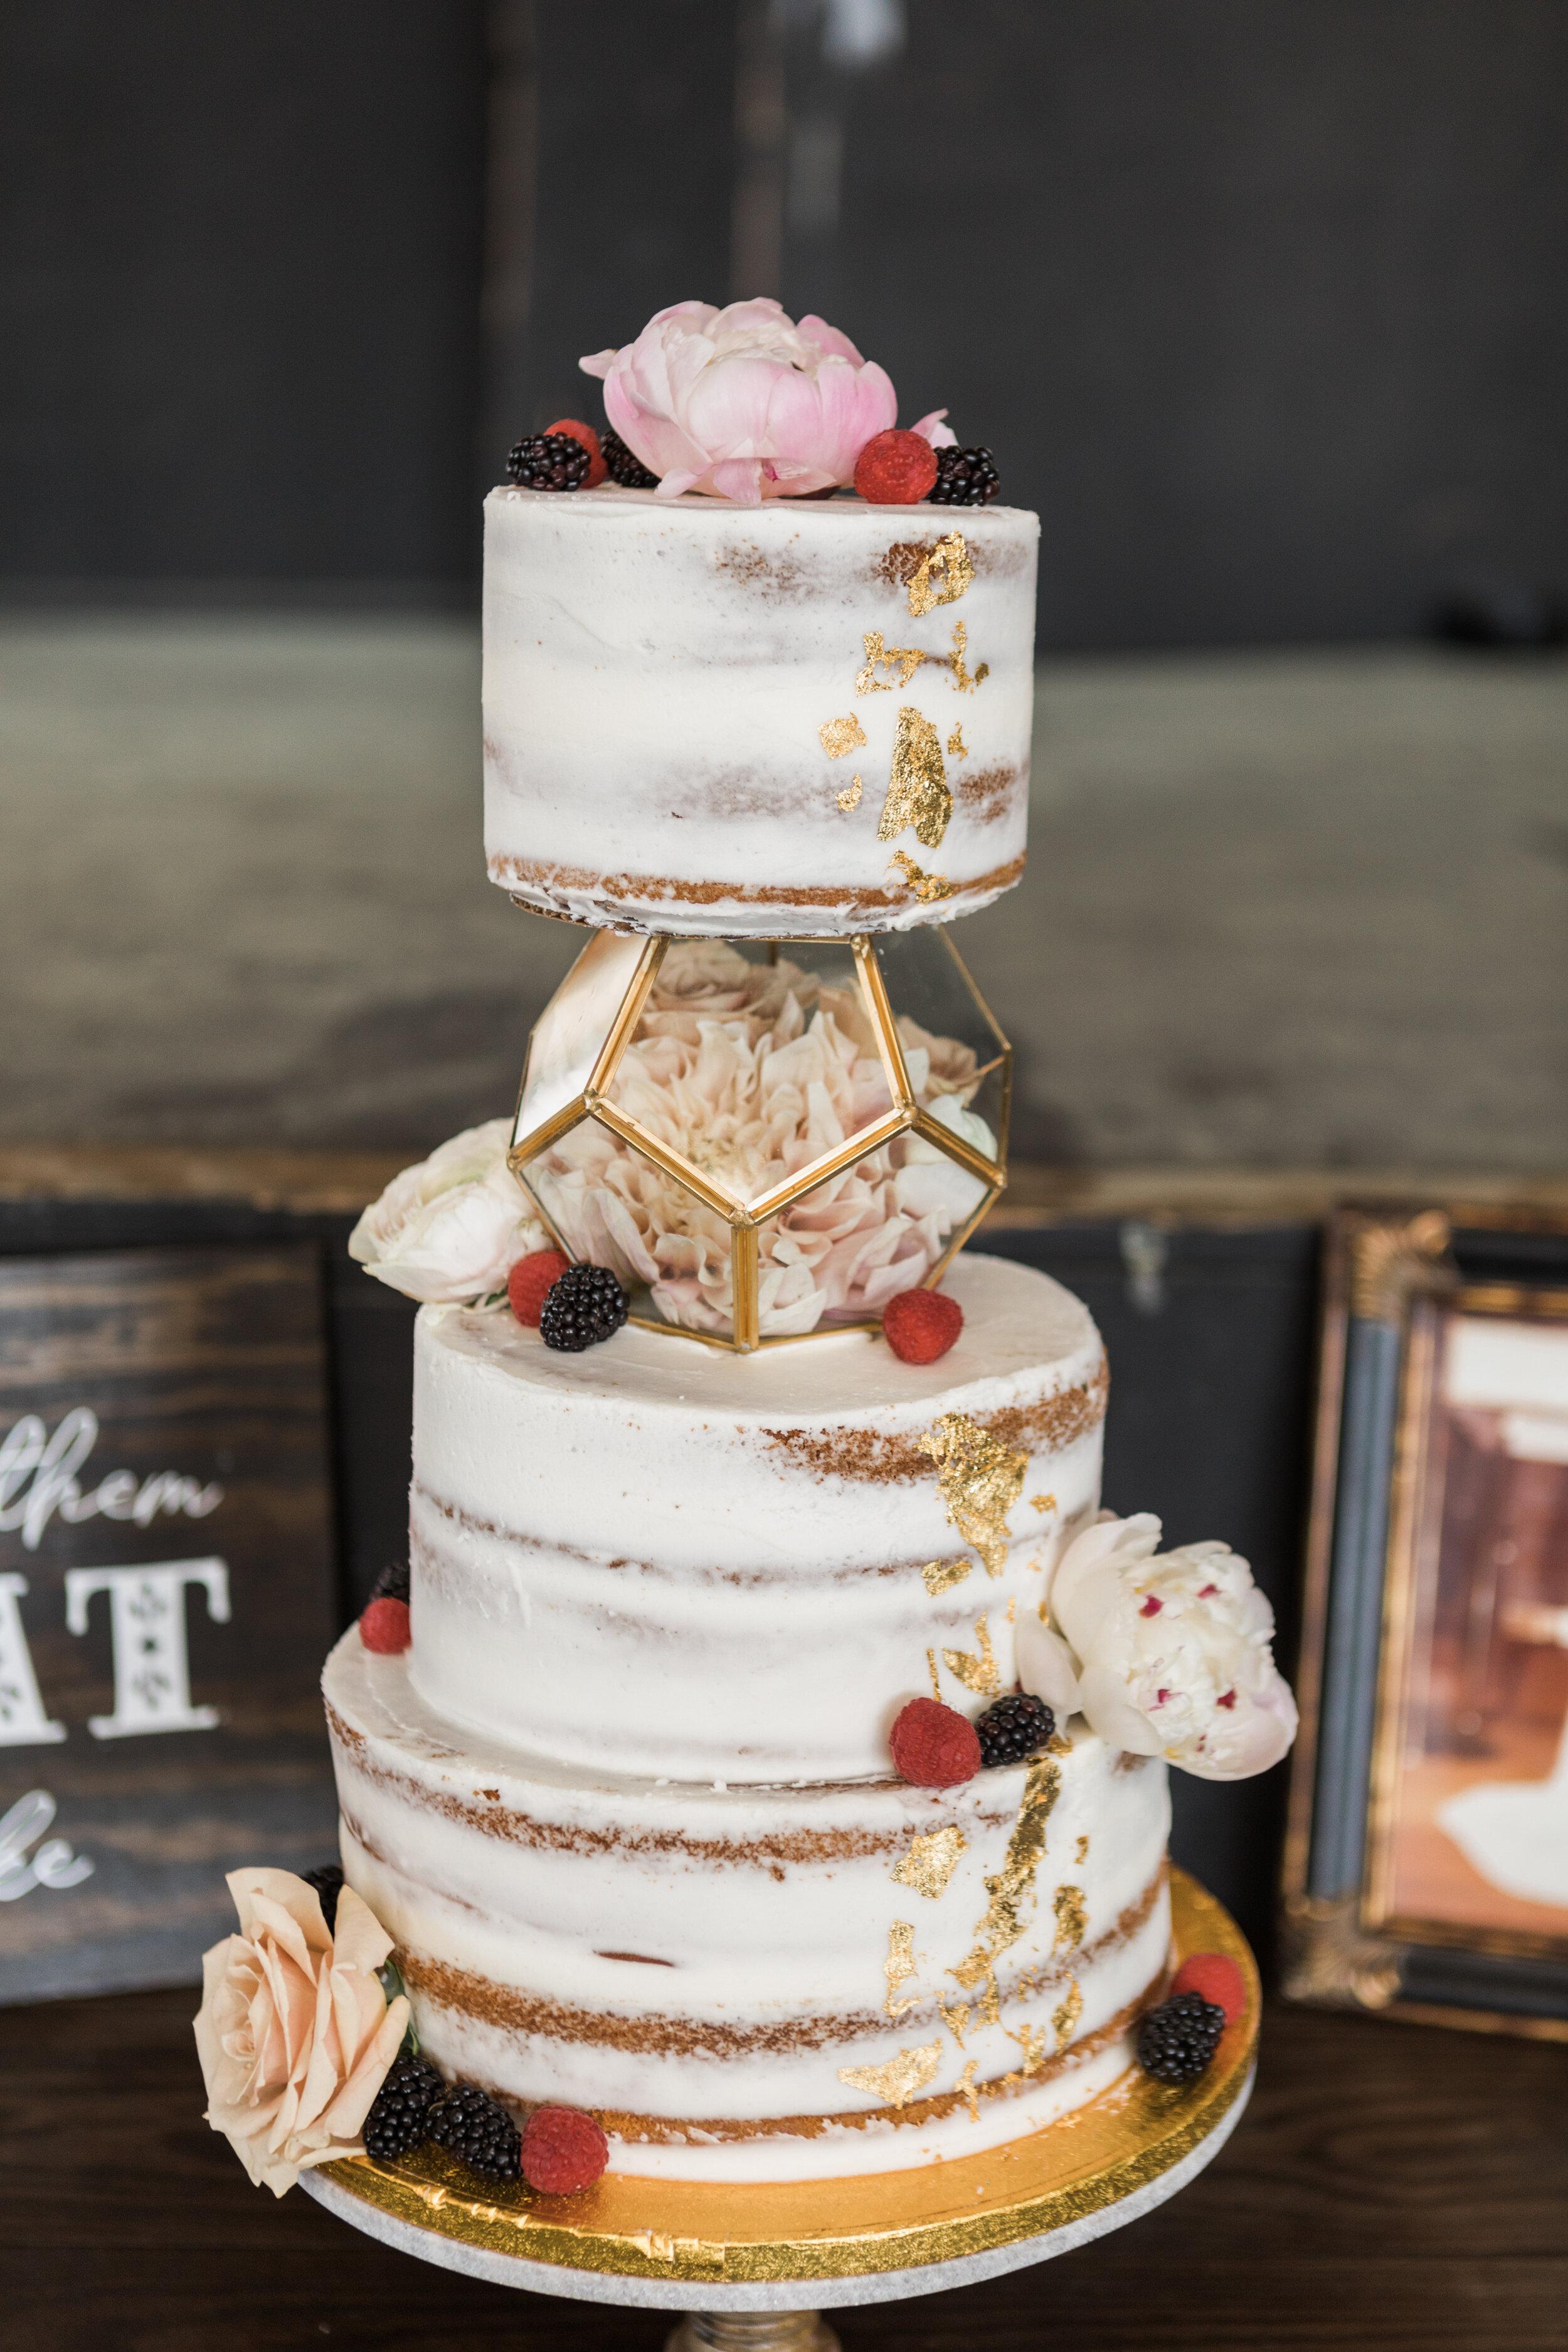 ivory-and-beau-blog-weddings-ivory-and-beau-couple-dominique-and-andres-savannah-florist-wedding-planning-savannah-bridal-boutique-wedding-flowers-KIP_WEBERWEDDING_RAILROADMUSEUM-1141.JPG